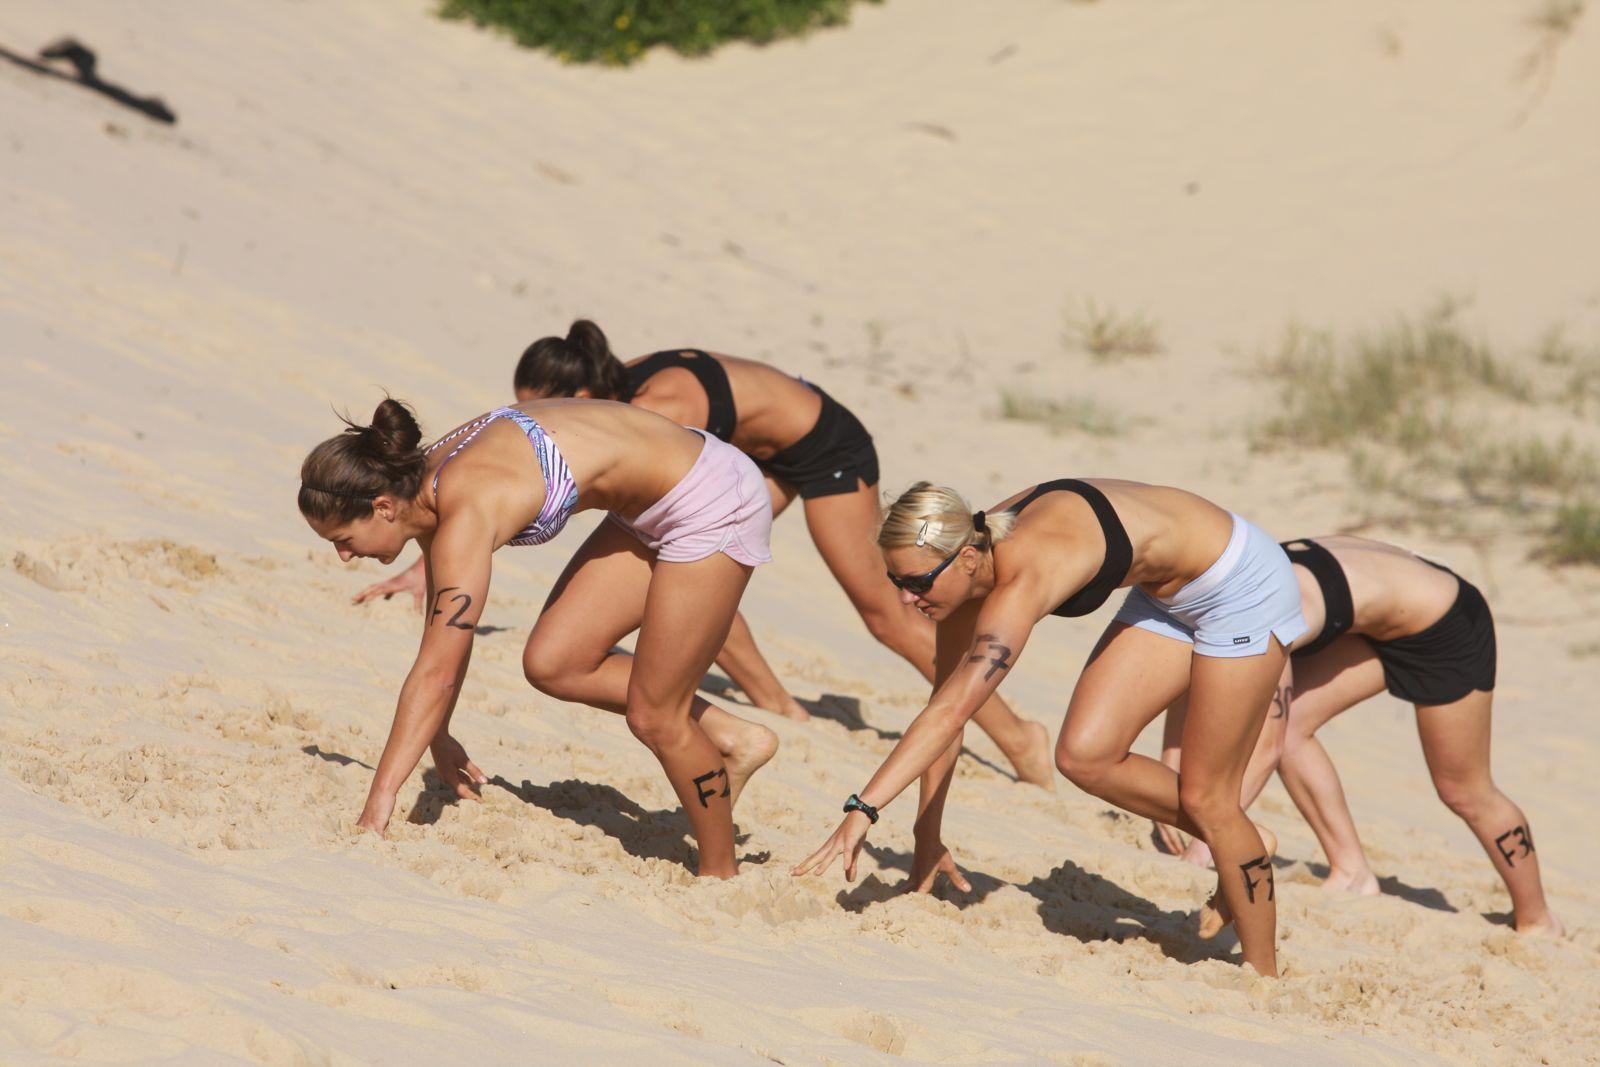 Фото девушки фитнес на пляже 13 фотография